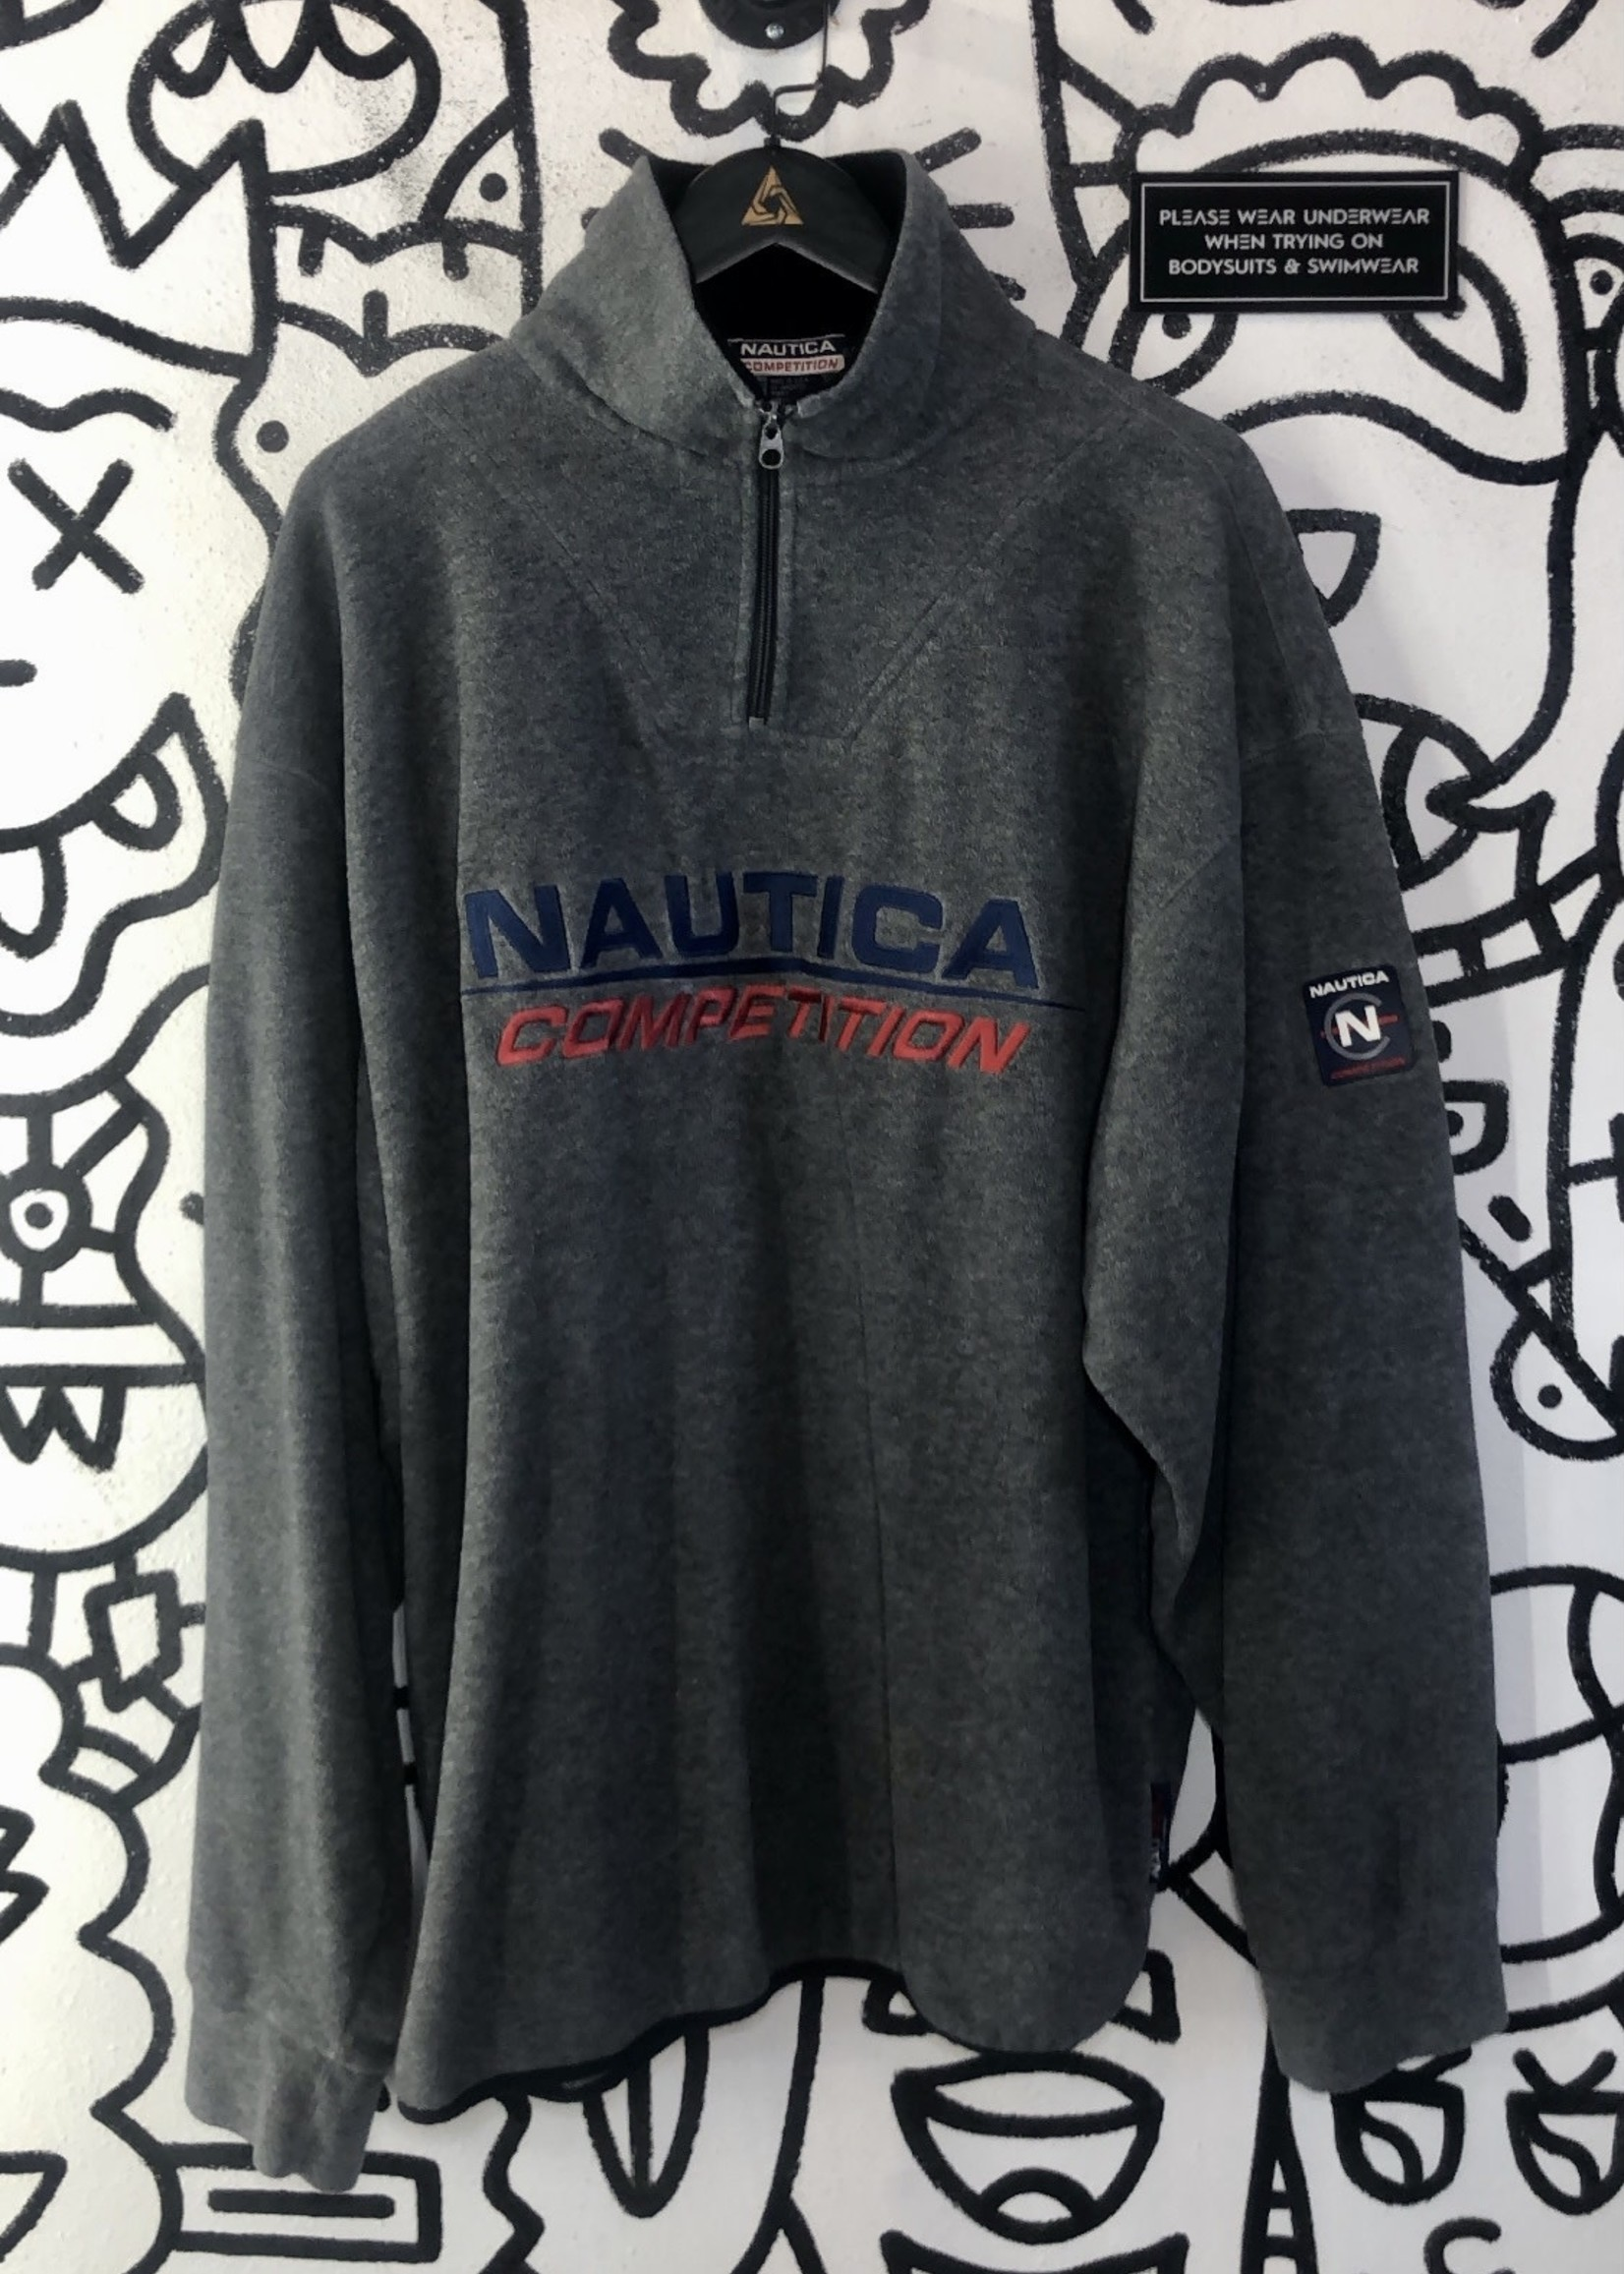 Vintage Nautica Competition Gray Fleece 1/4 Zip Jacket XXL